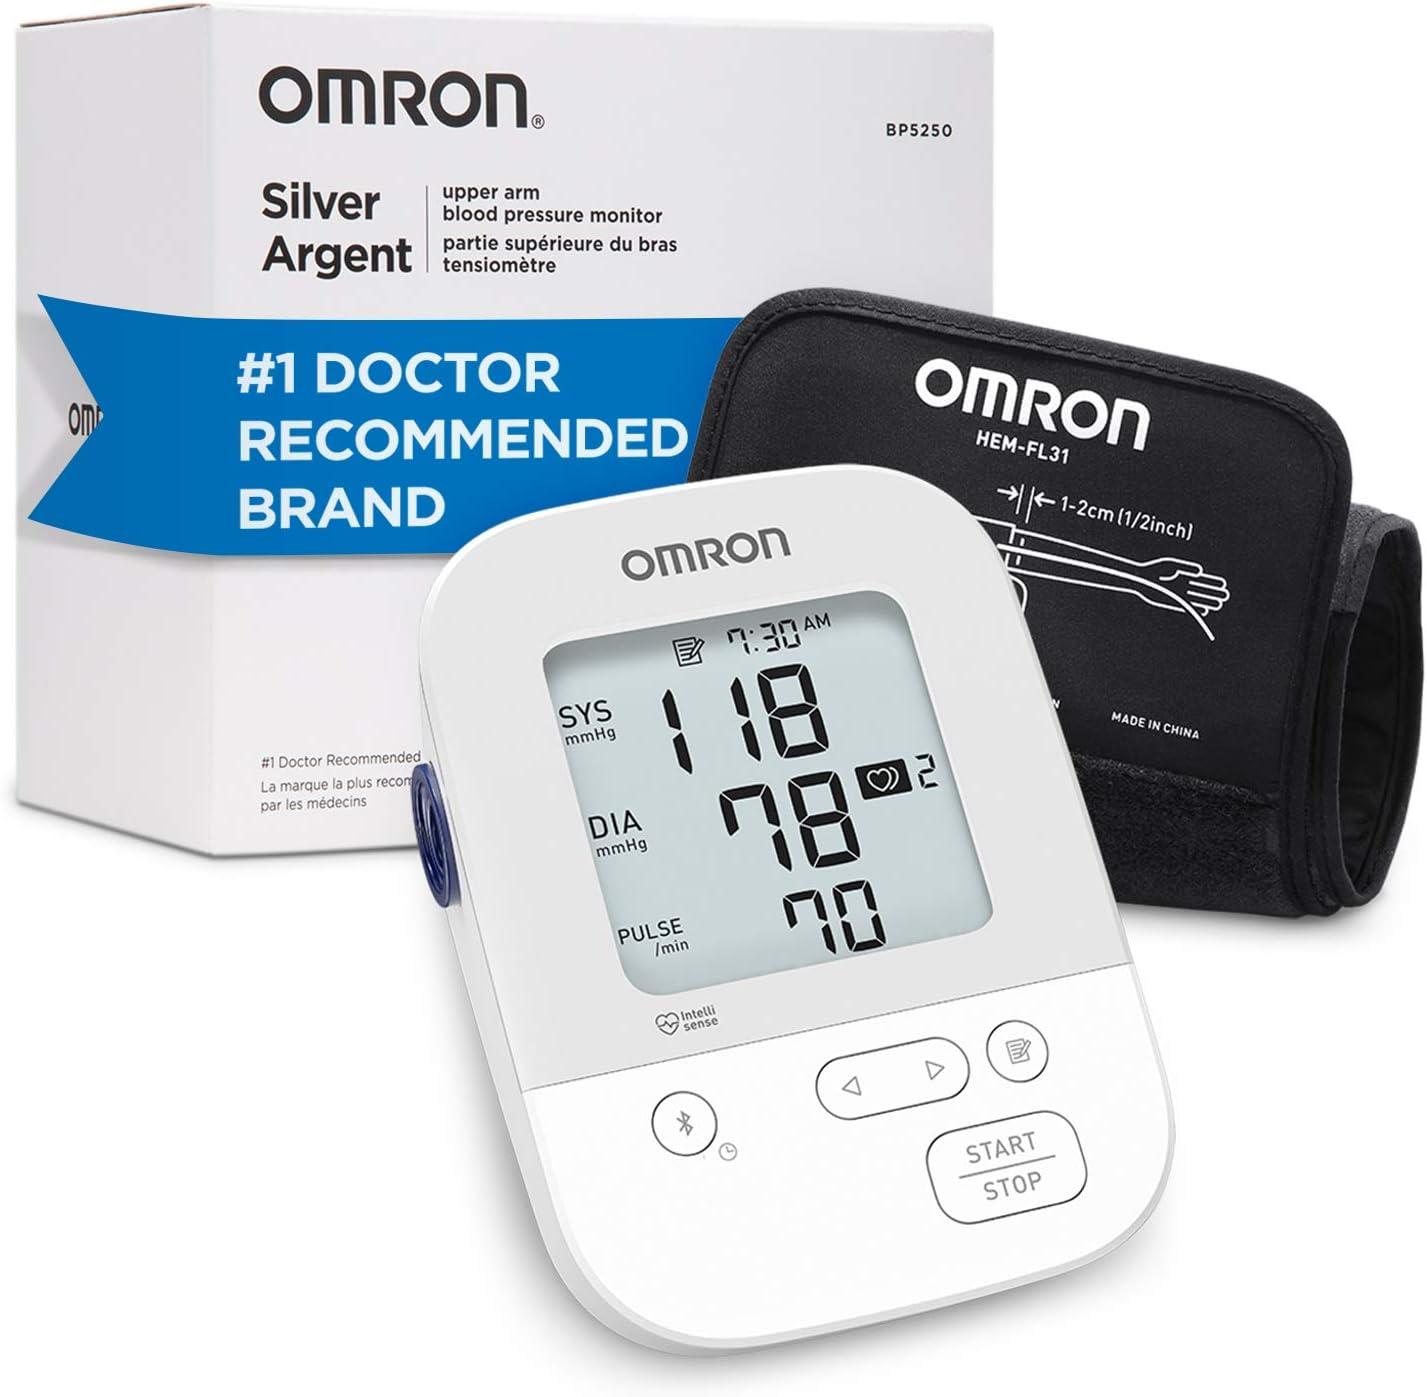 Amazon Com Omron Silver Blood Pressure Monitor Upper Arm Cuff Digital Bluetooth Blood Pressure Machine Storesup To 80 Readings Health Personal Care